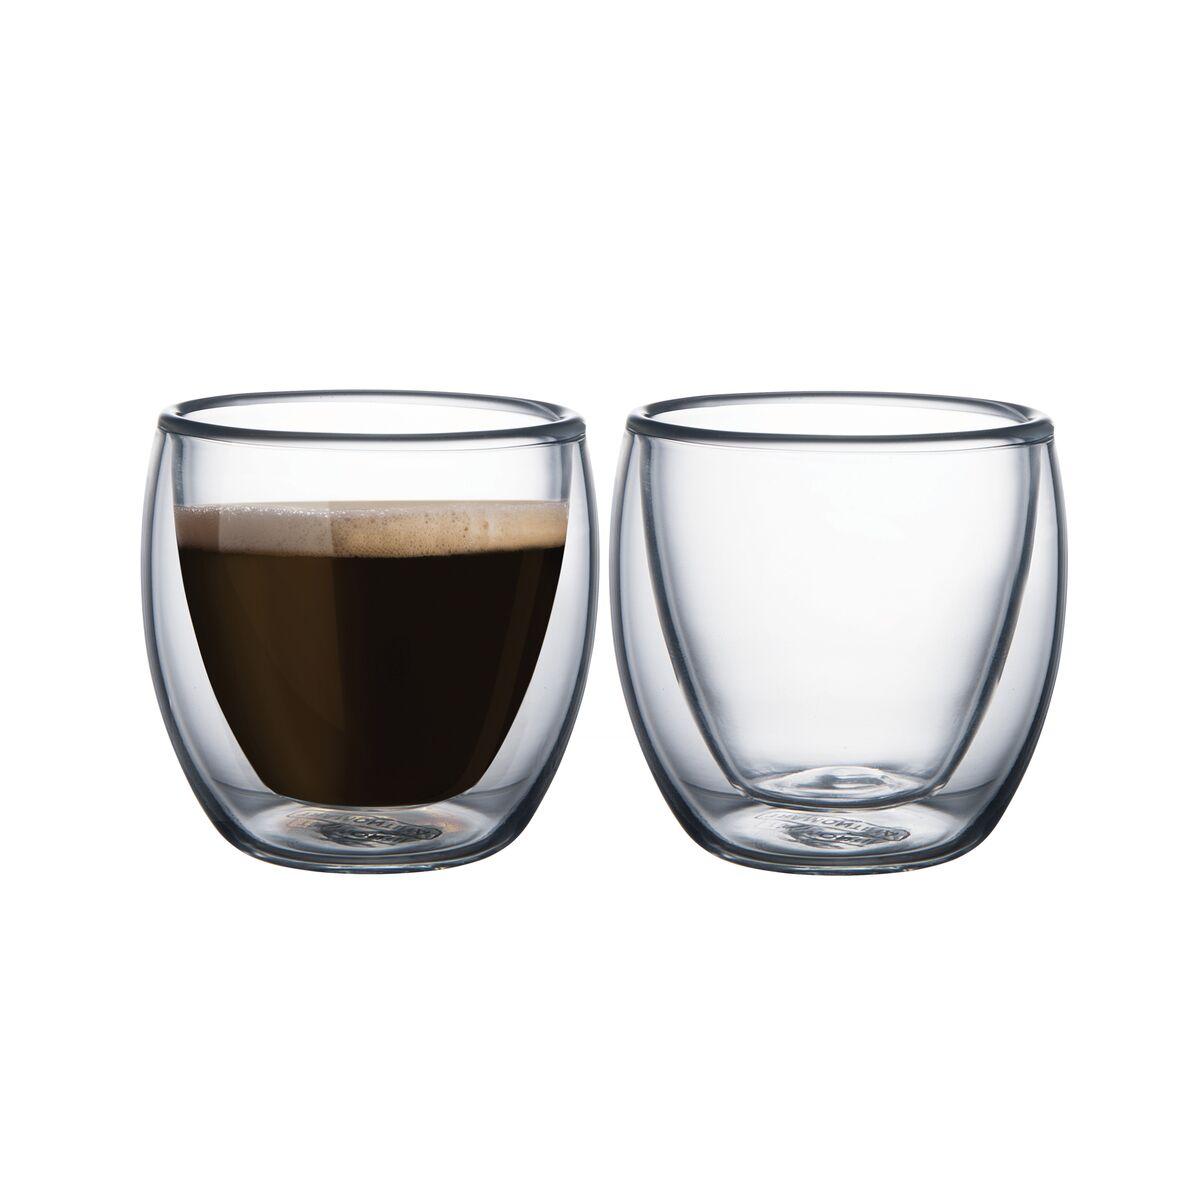 Juego de tazas Tramontina para café con vidrio doble 2 piezas